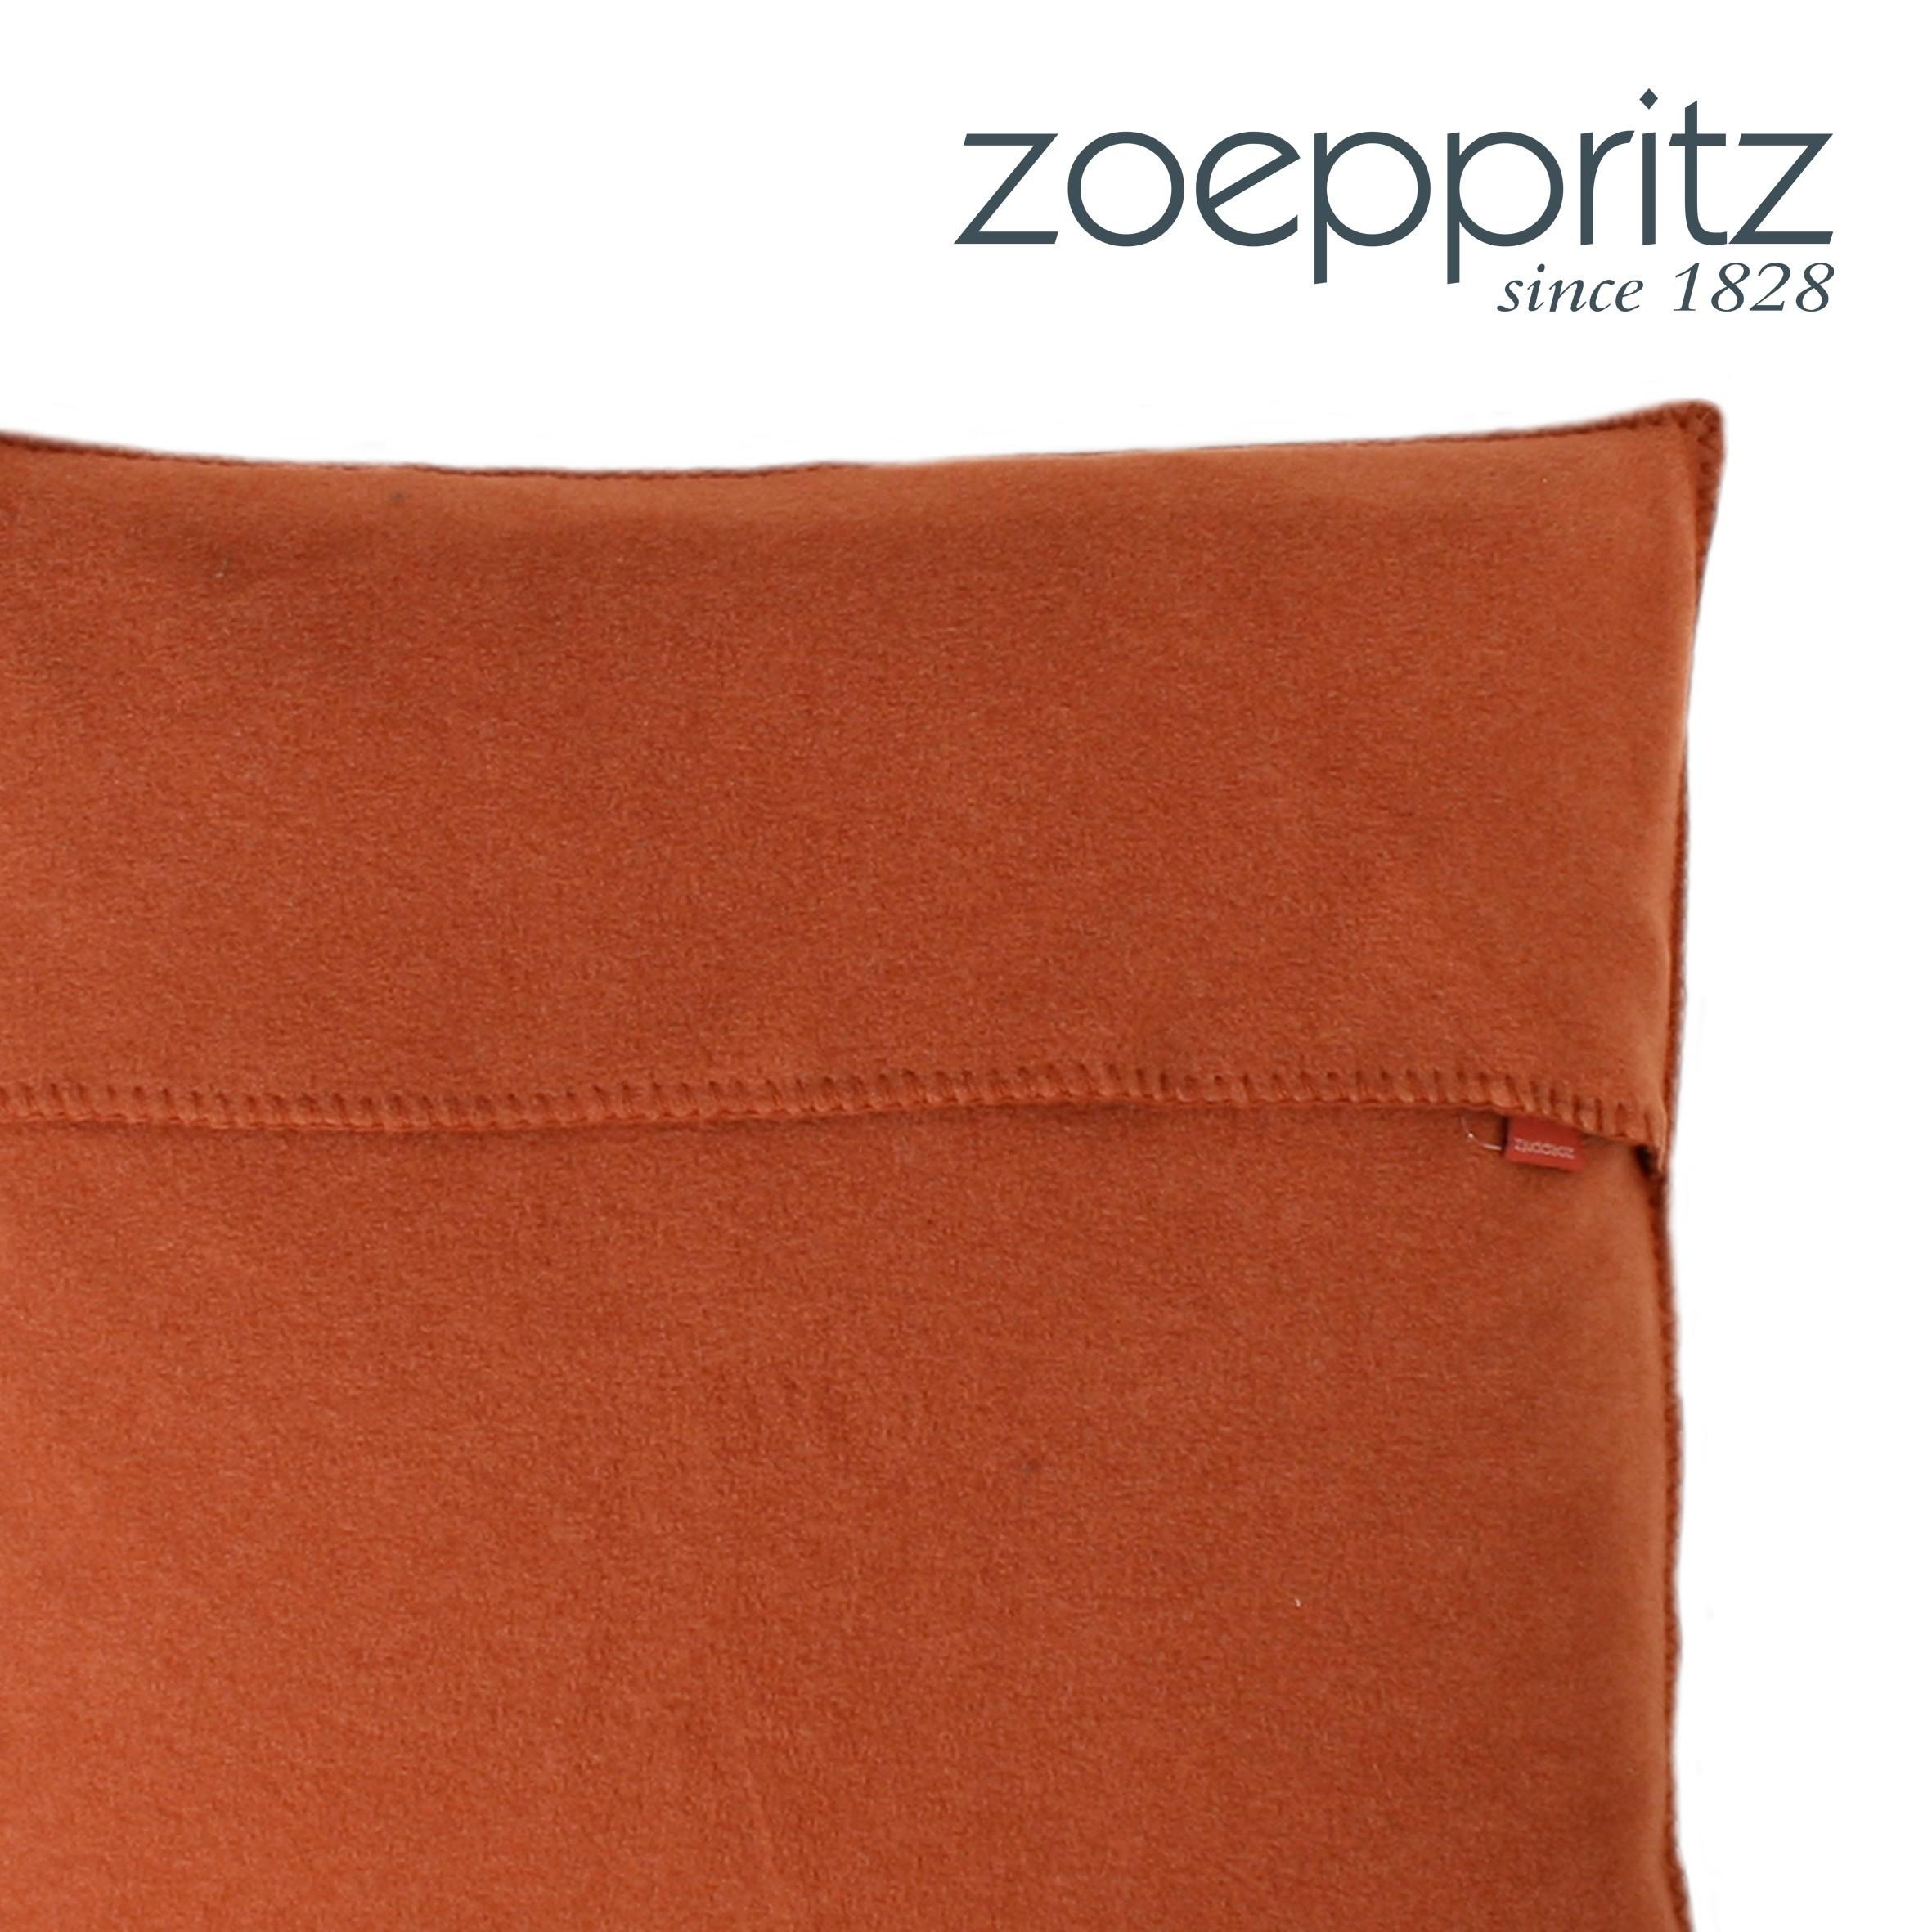 zoeppritz dekokissen soft fleece holz. Black Bedroom Furniture Sets. Home Design Ideas